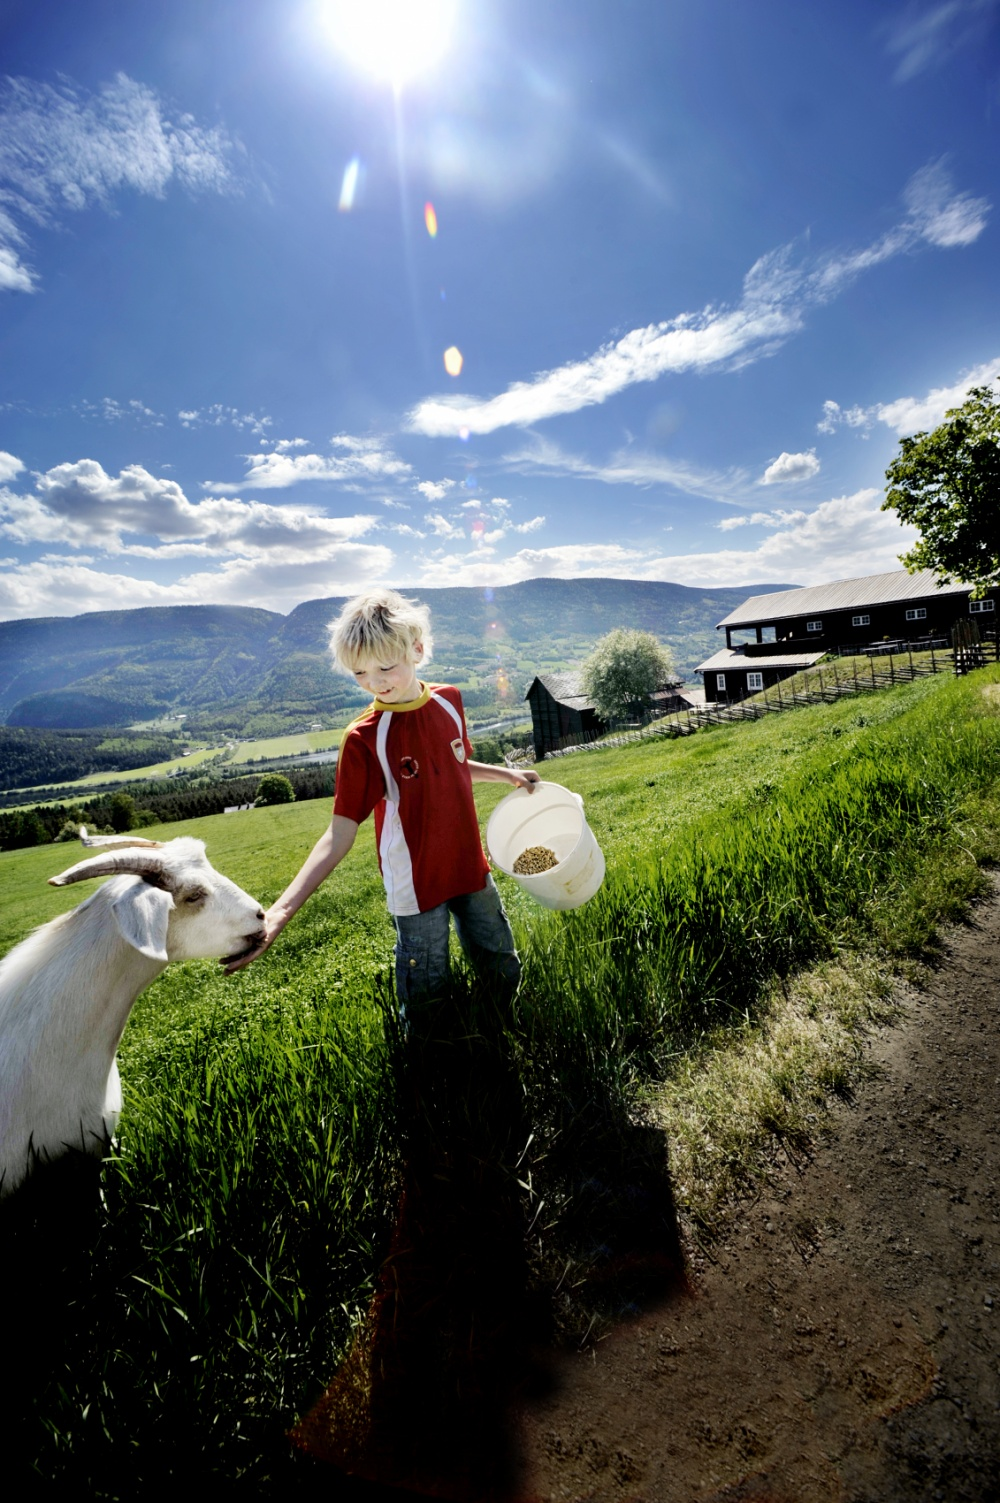 John T. Pedersen Photography - Farmer boy